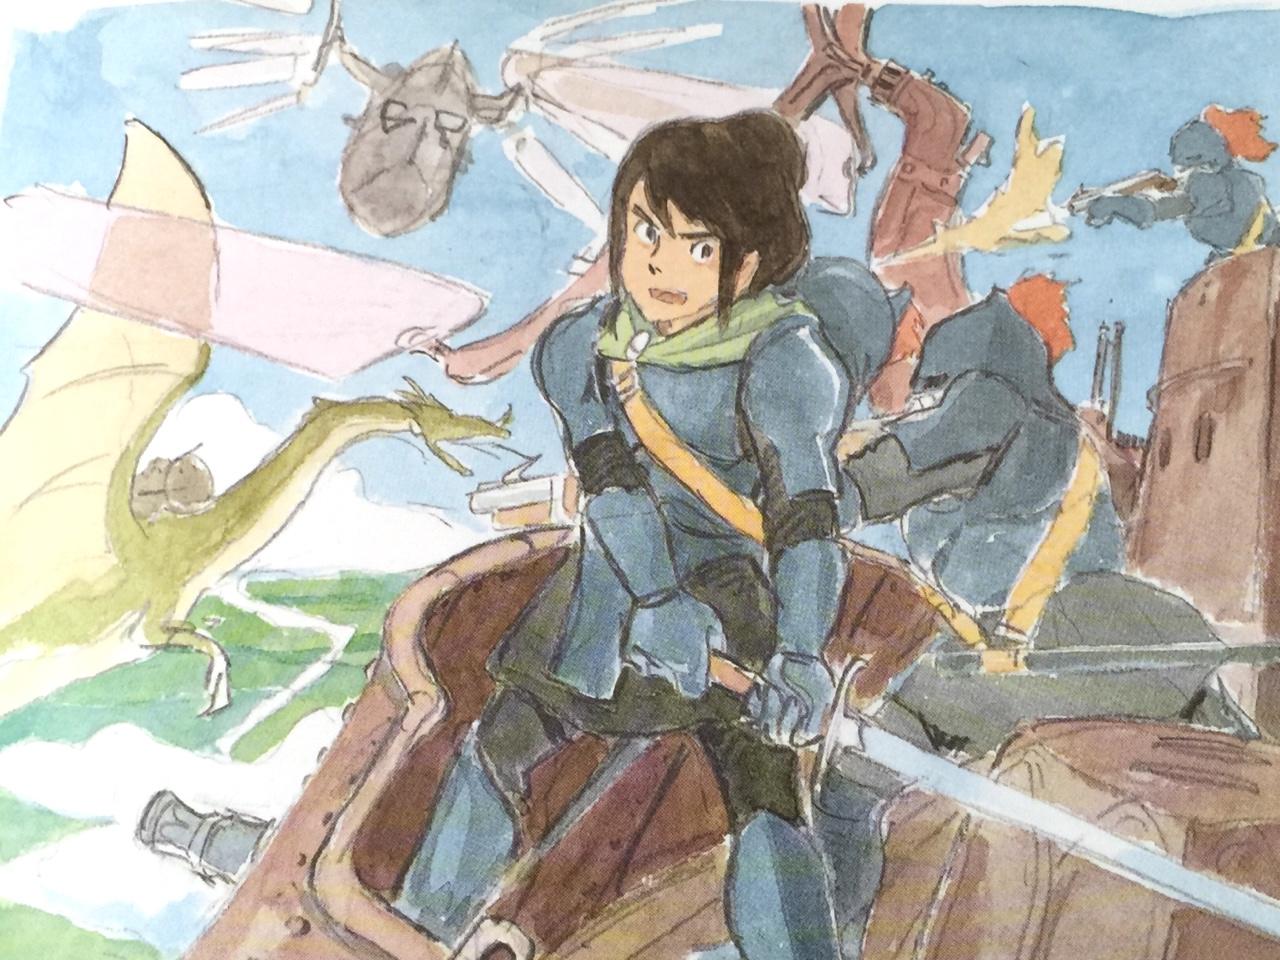 Hayao-Miyazaki-The-Art-of-Nausica-Of-The-Valley-Of-The-Wind-Watercolor-Impressions-nausicaa-of-the-valley-of-the-wind-39115022-1280-960.jpg